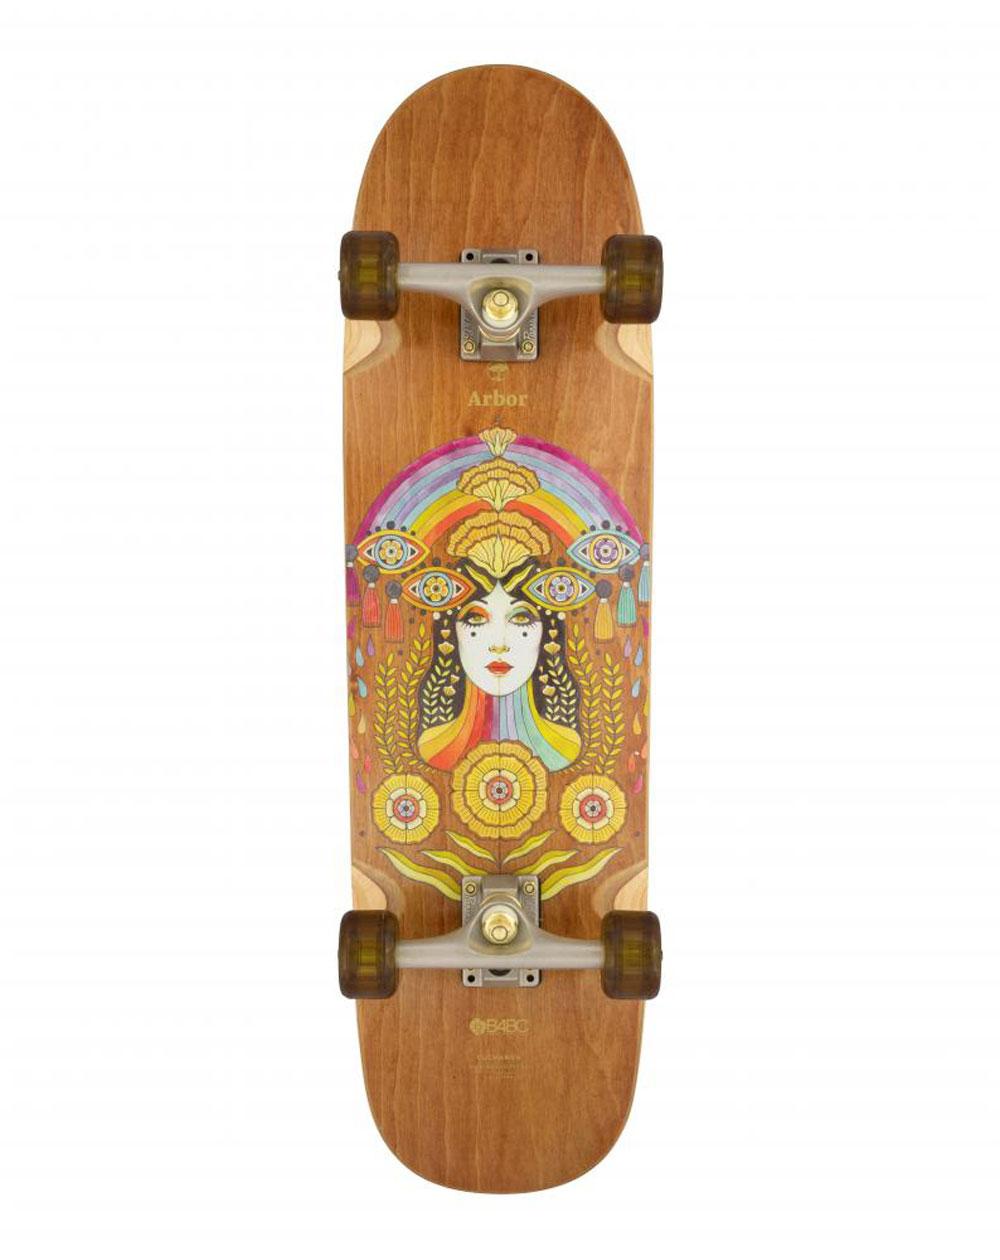 "Arbor Solstice Cucharon 32.375"" Skateboard Cruiser"